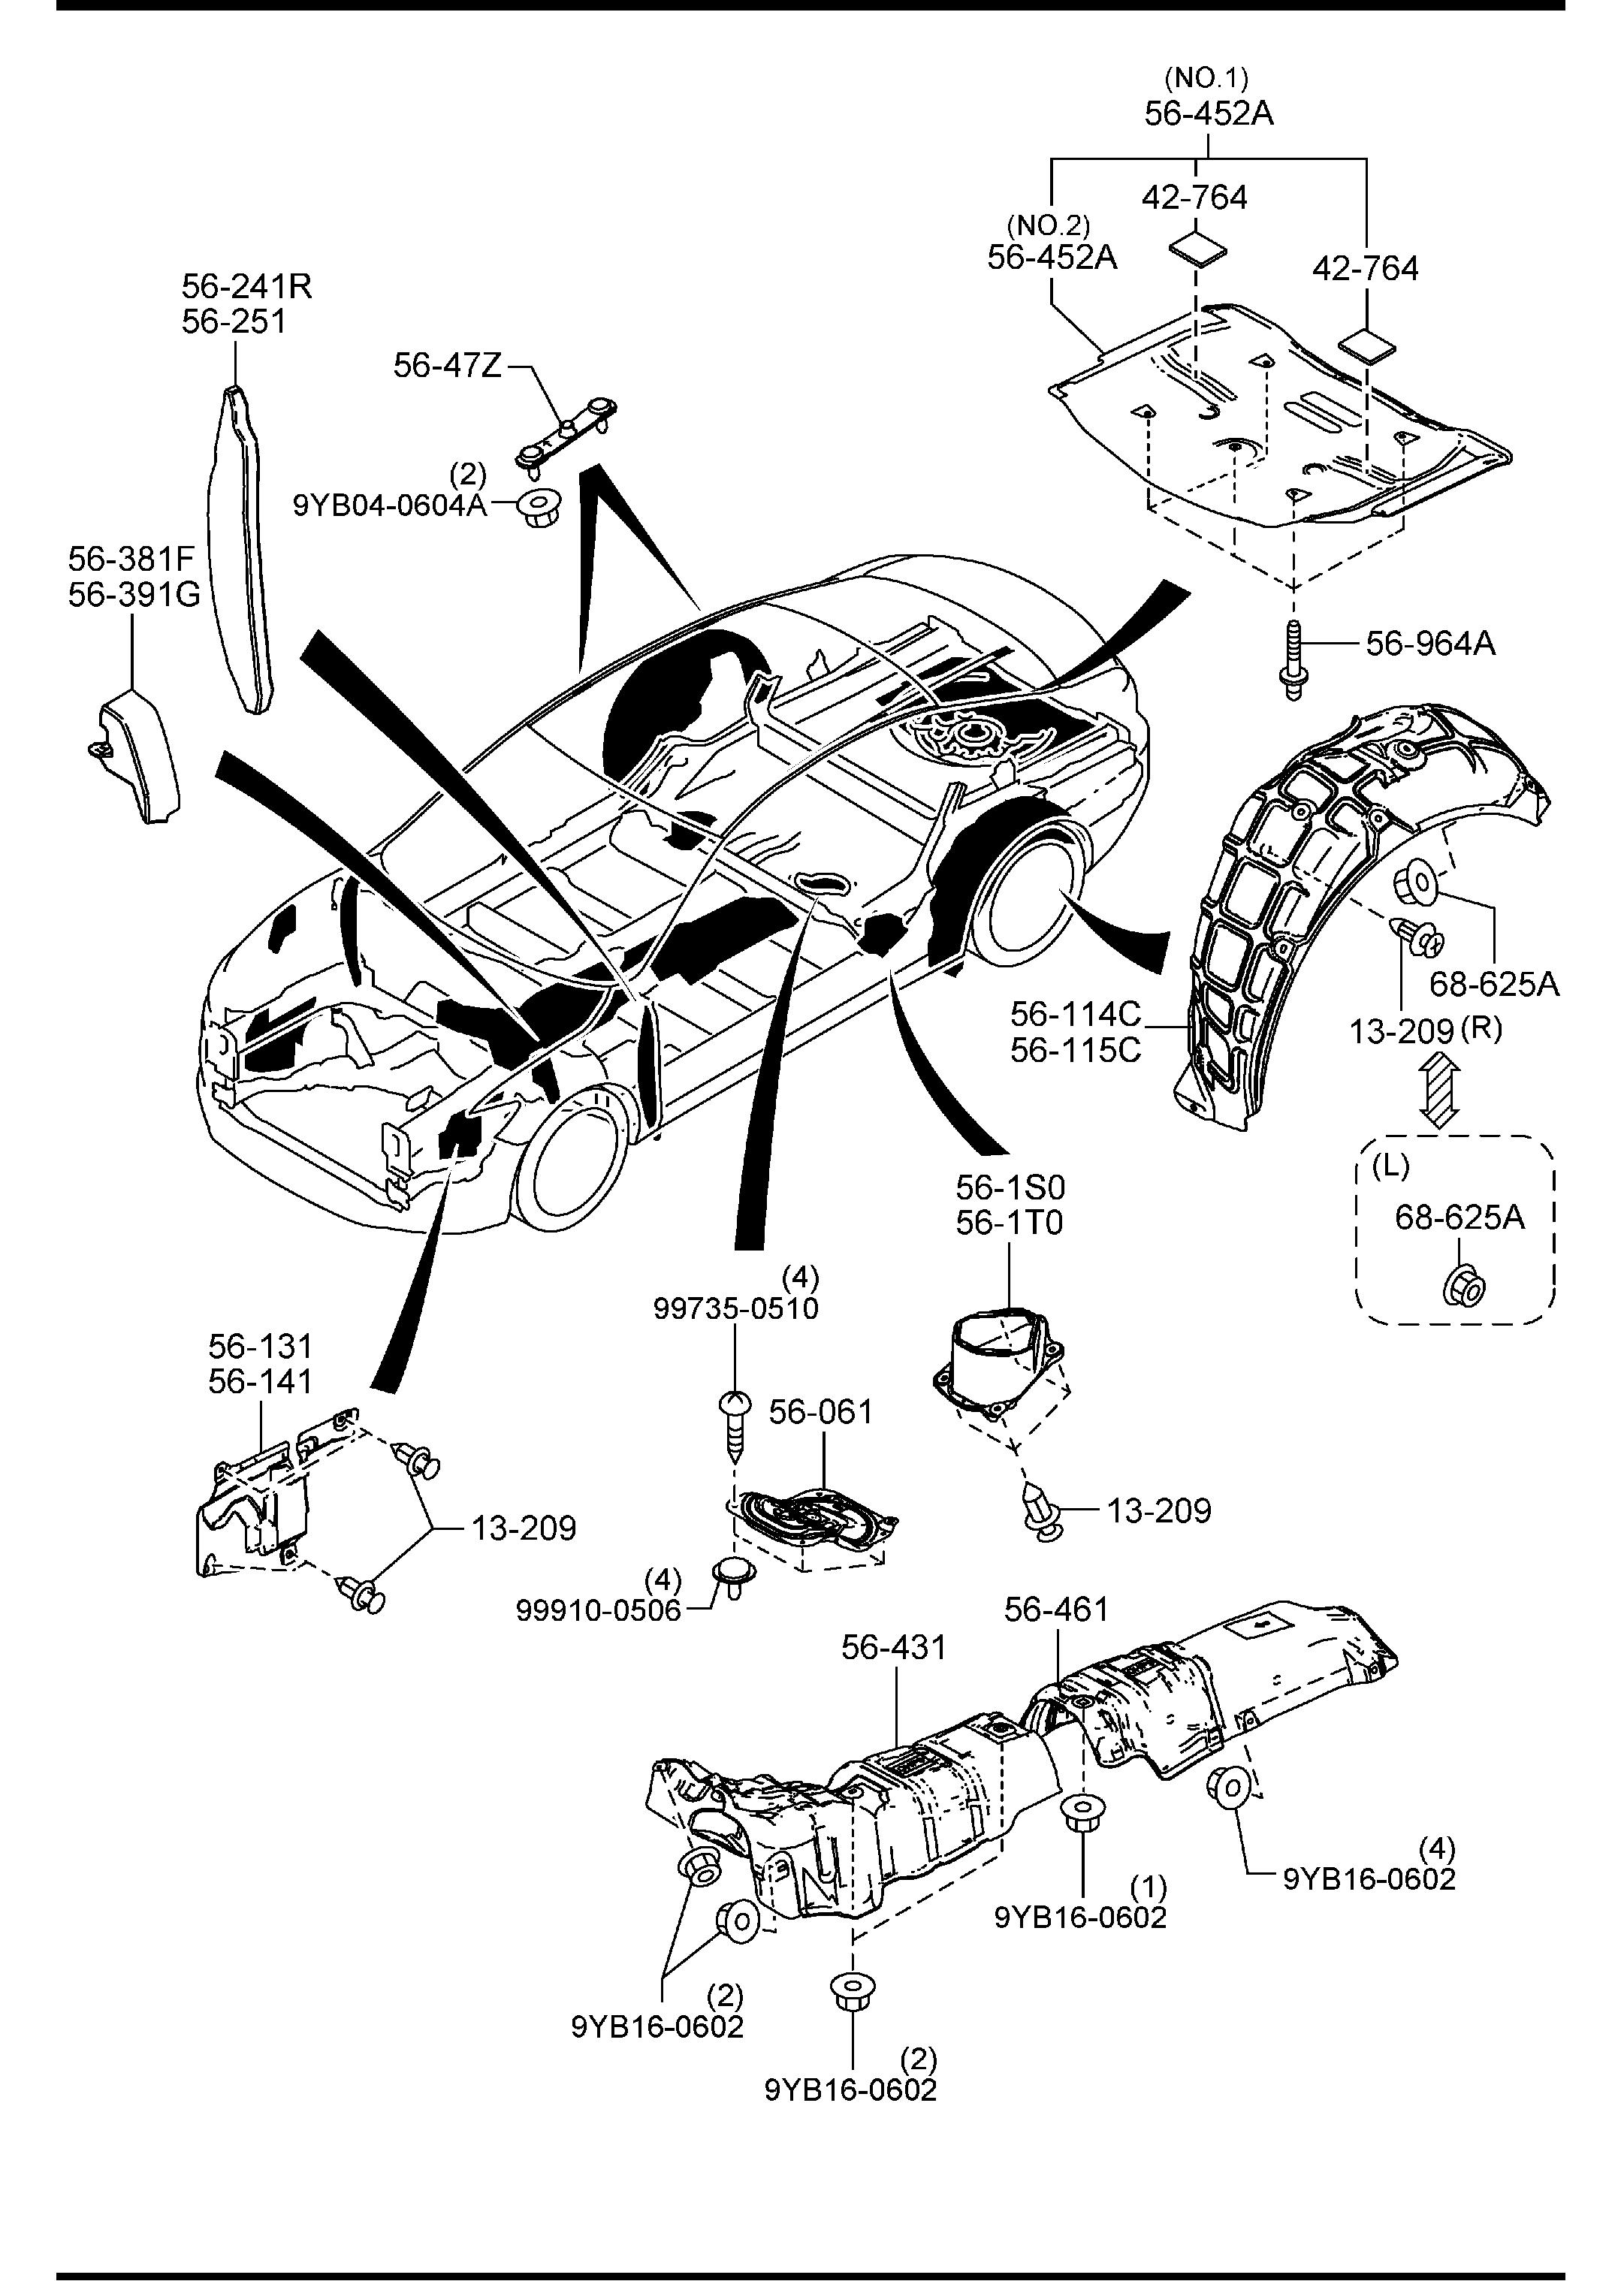 Mazda Mazda 6 Fastener Led Closure Impact